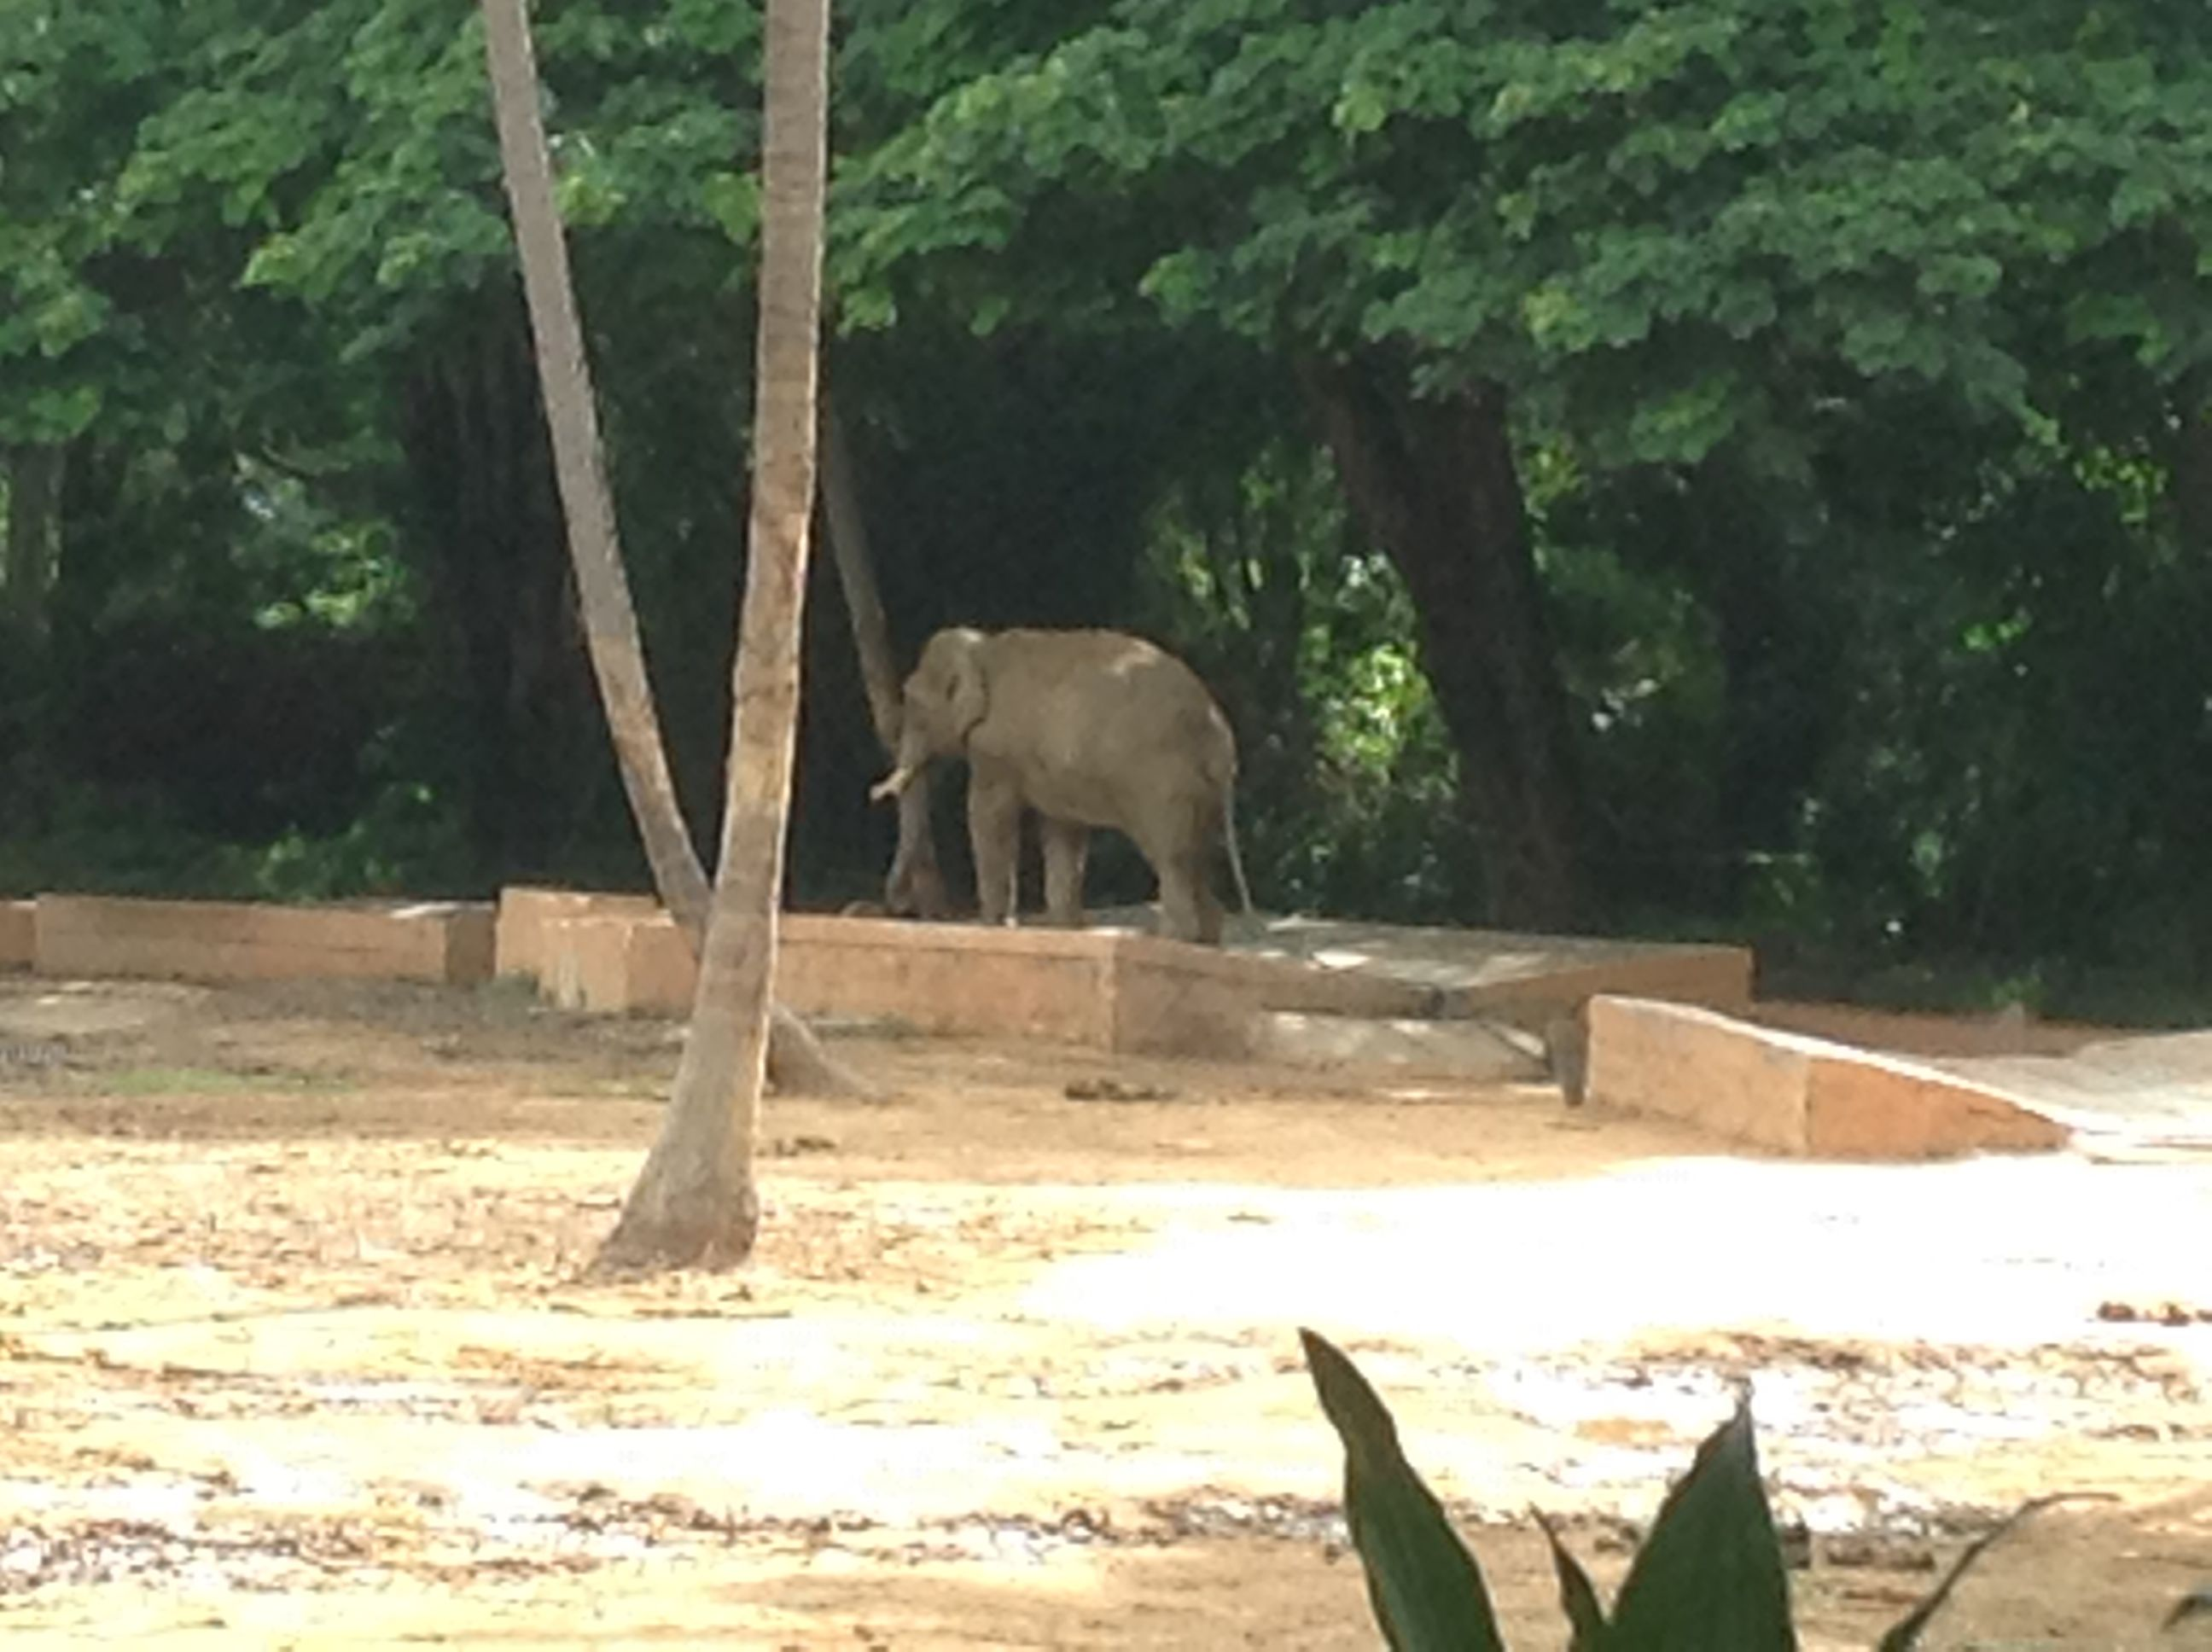 f7674f4386402ff19d22a6d8fd5eb823 - Mysore Zoo Sri Chamarajendra Zoological Gardens